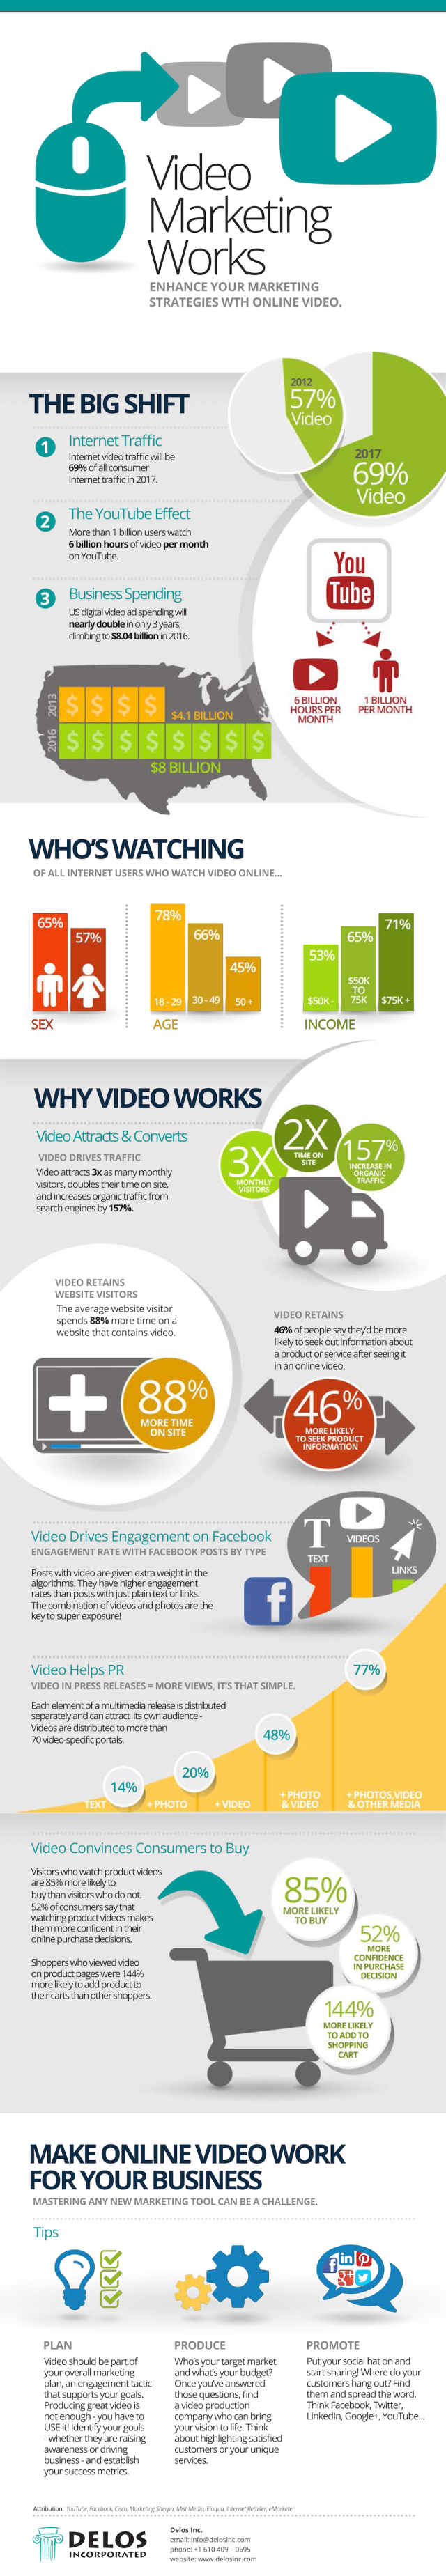 Video marketing works #infografia #infographic #marketing